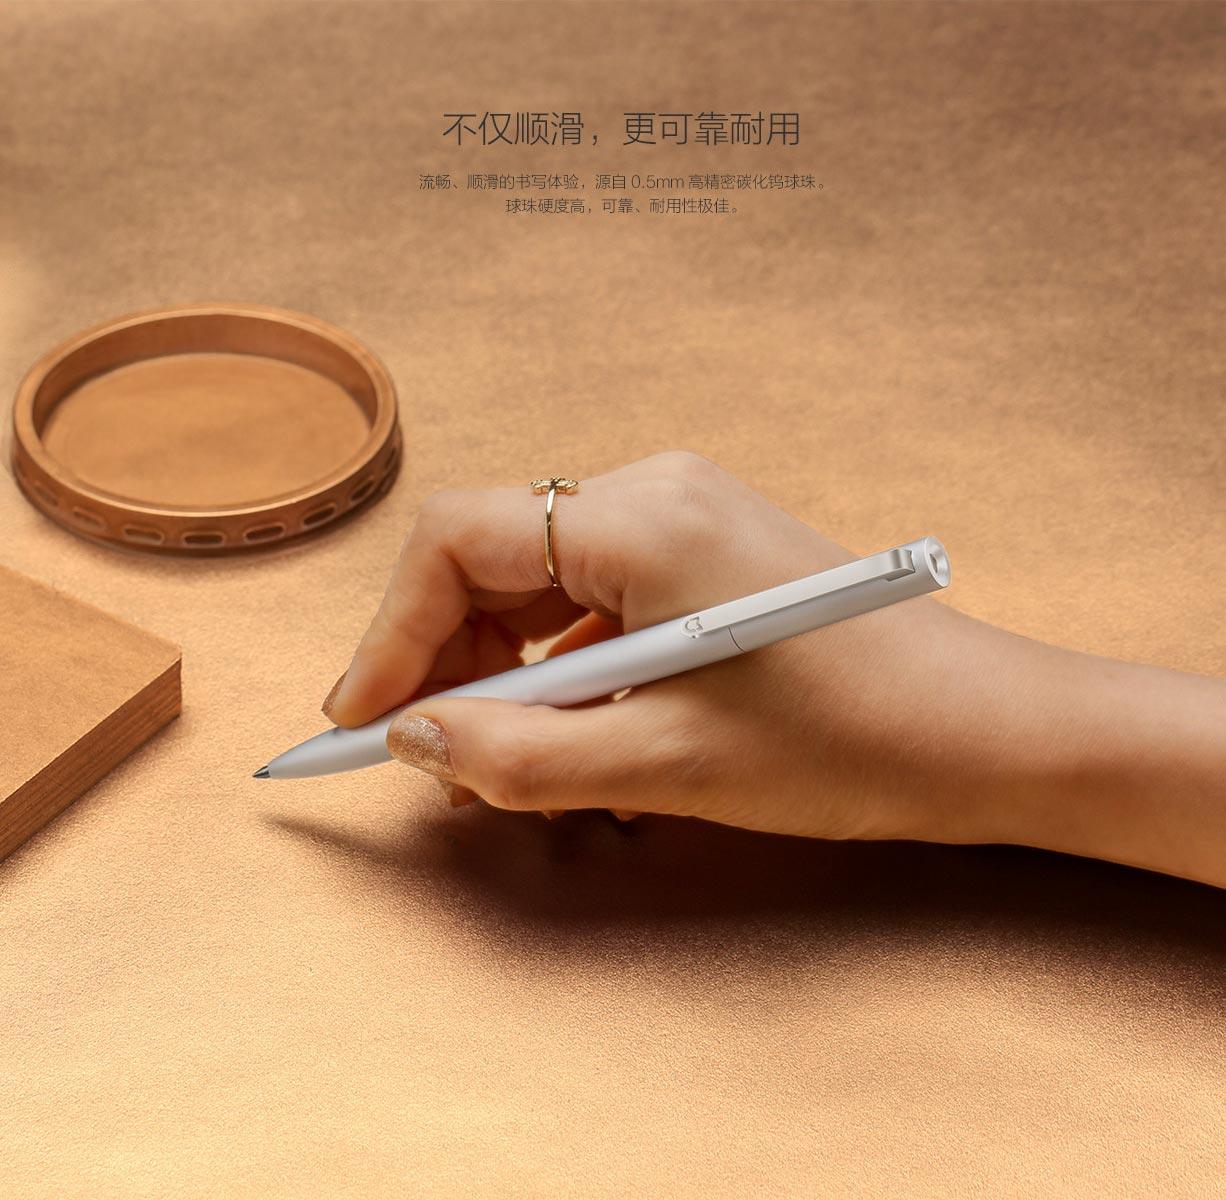 mi pen 6.jpg